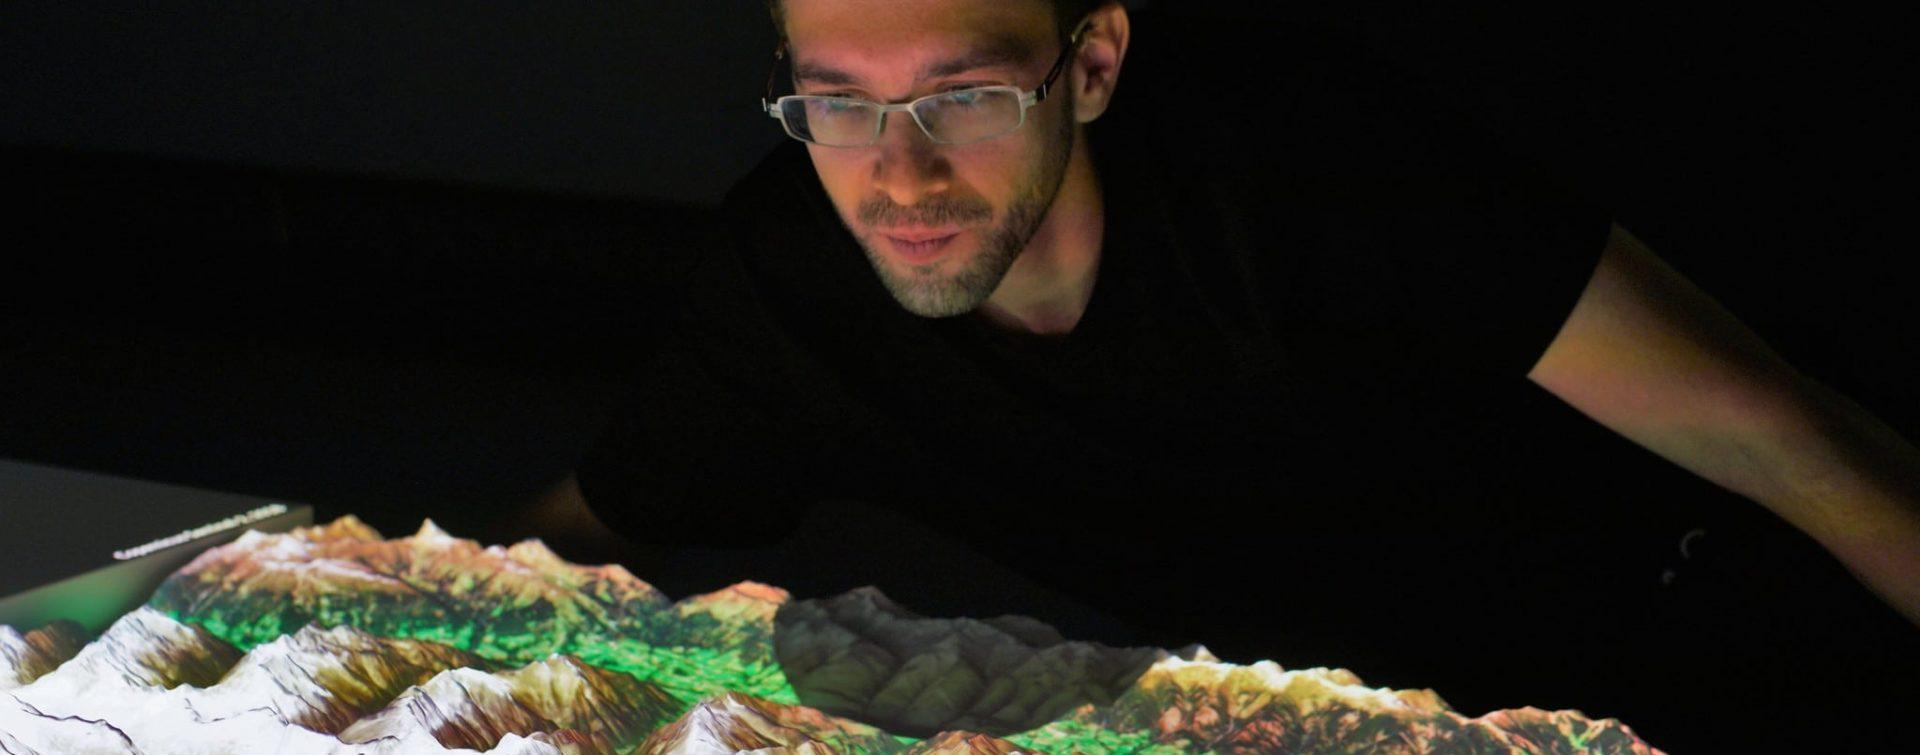 Klimawandel im Blick - interaktive Projektion